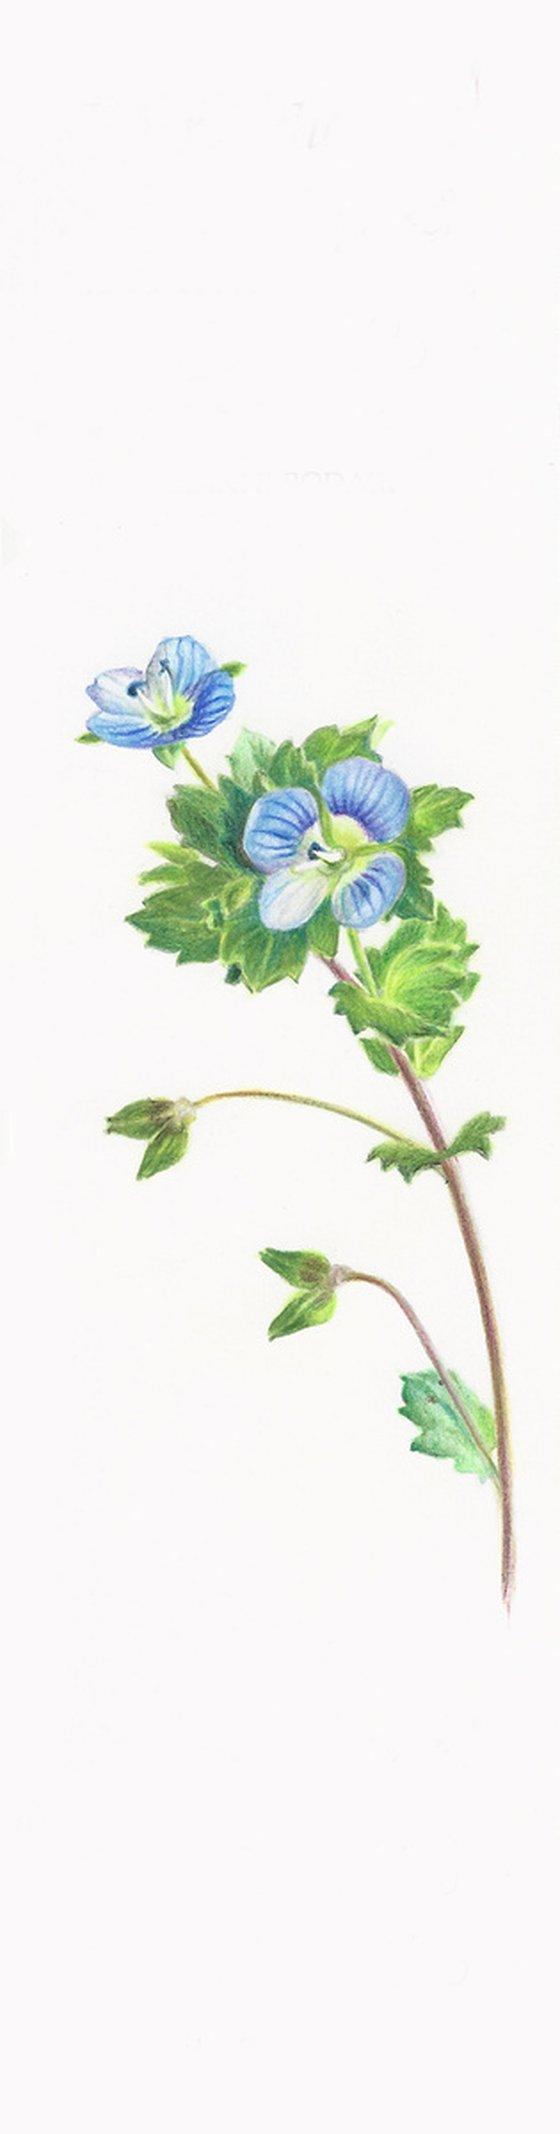 Birdeye Speedwell - from my Wildflowers Bookmarks Collection